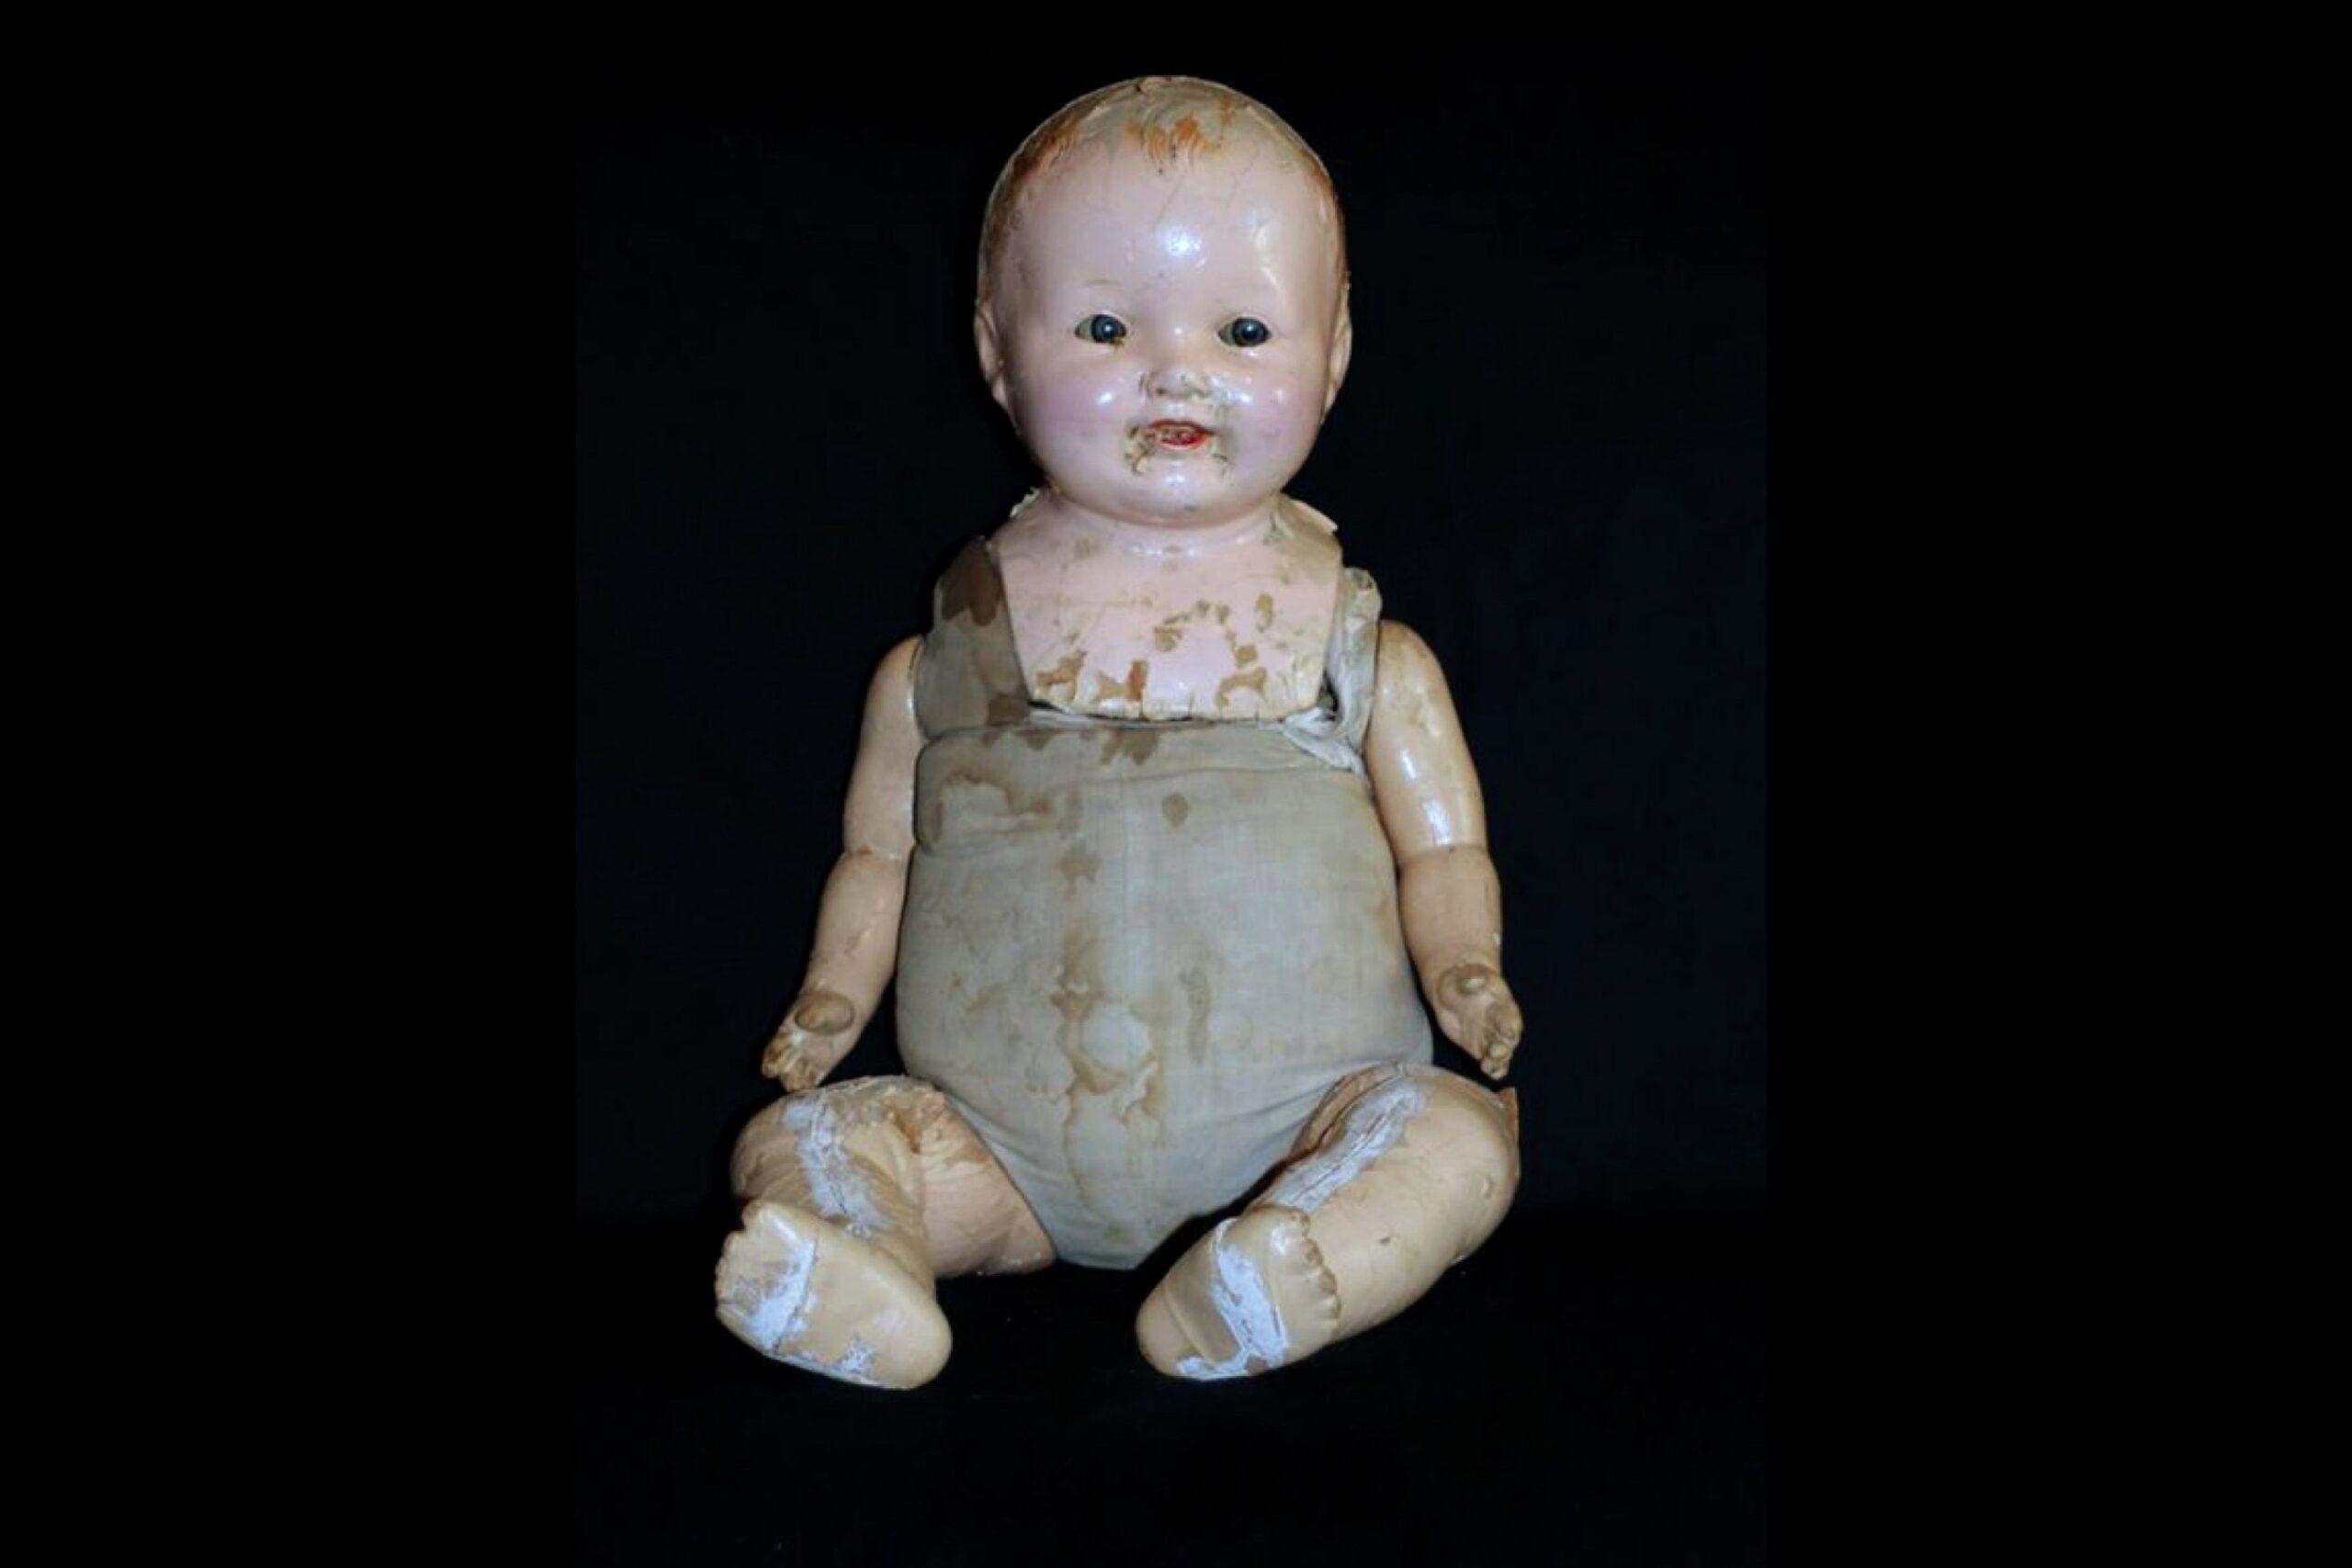 Harold the Haunted Doll